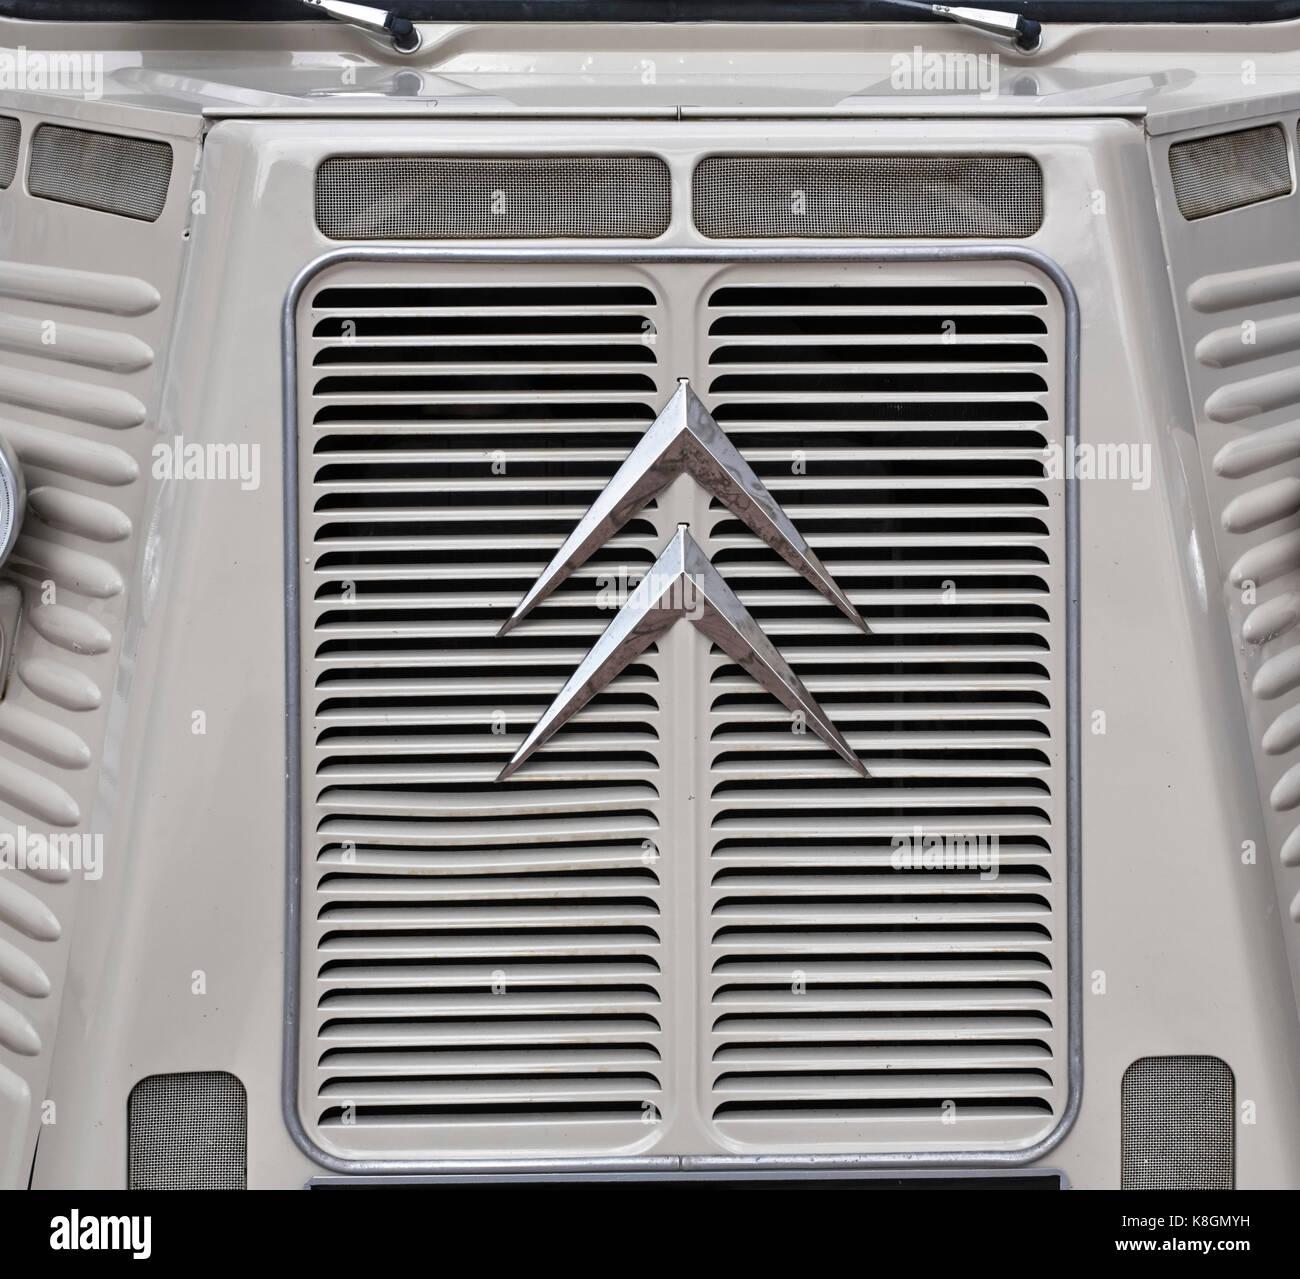 Front of a Citroen van radiator grill - Stock Image